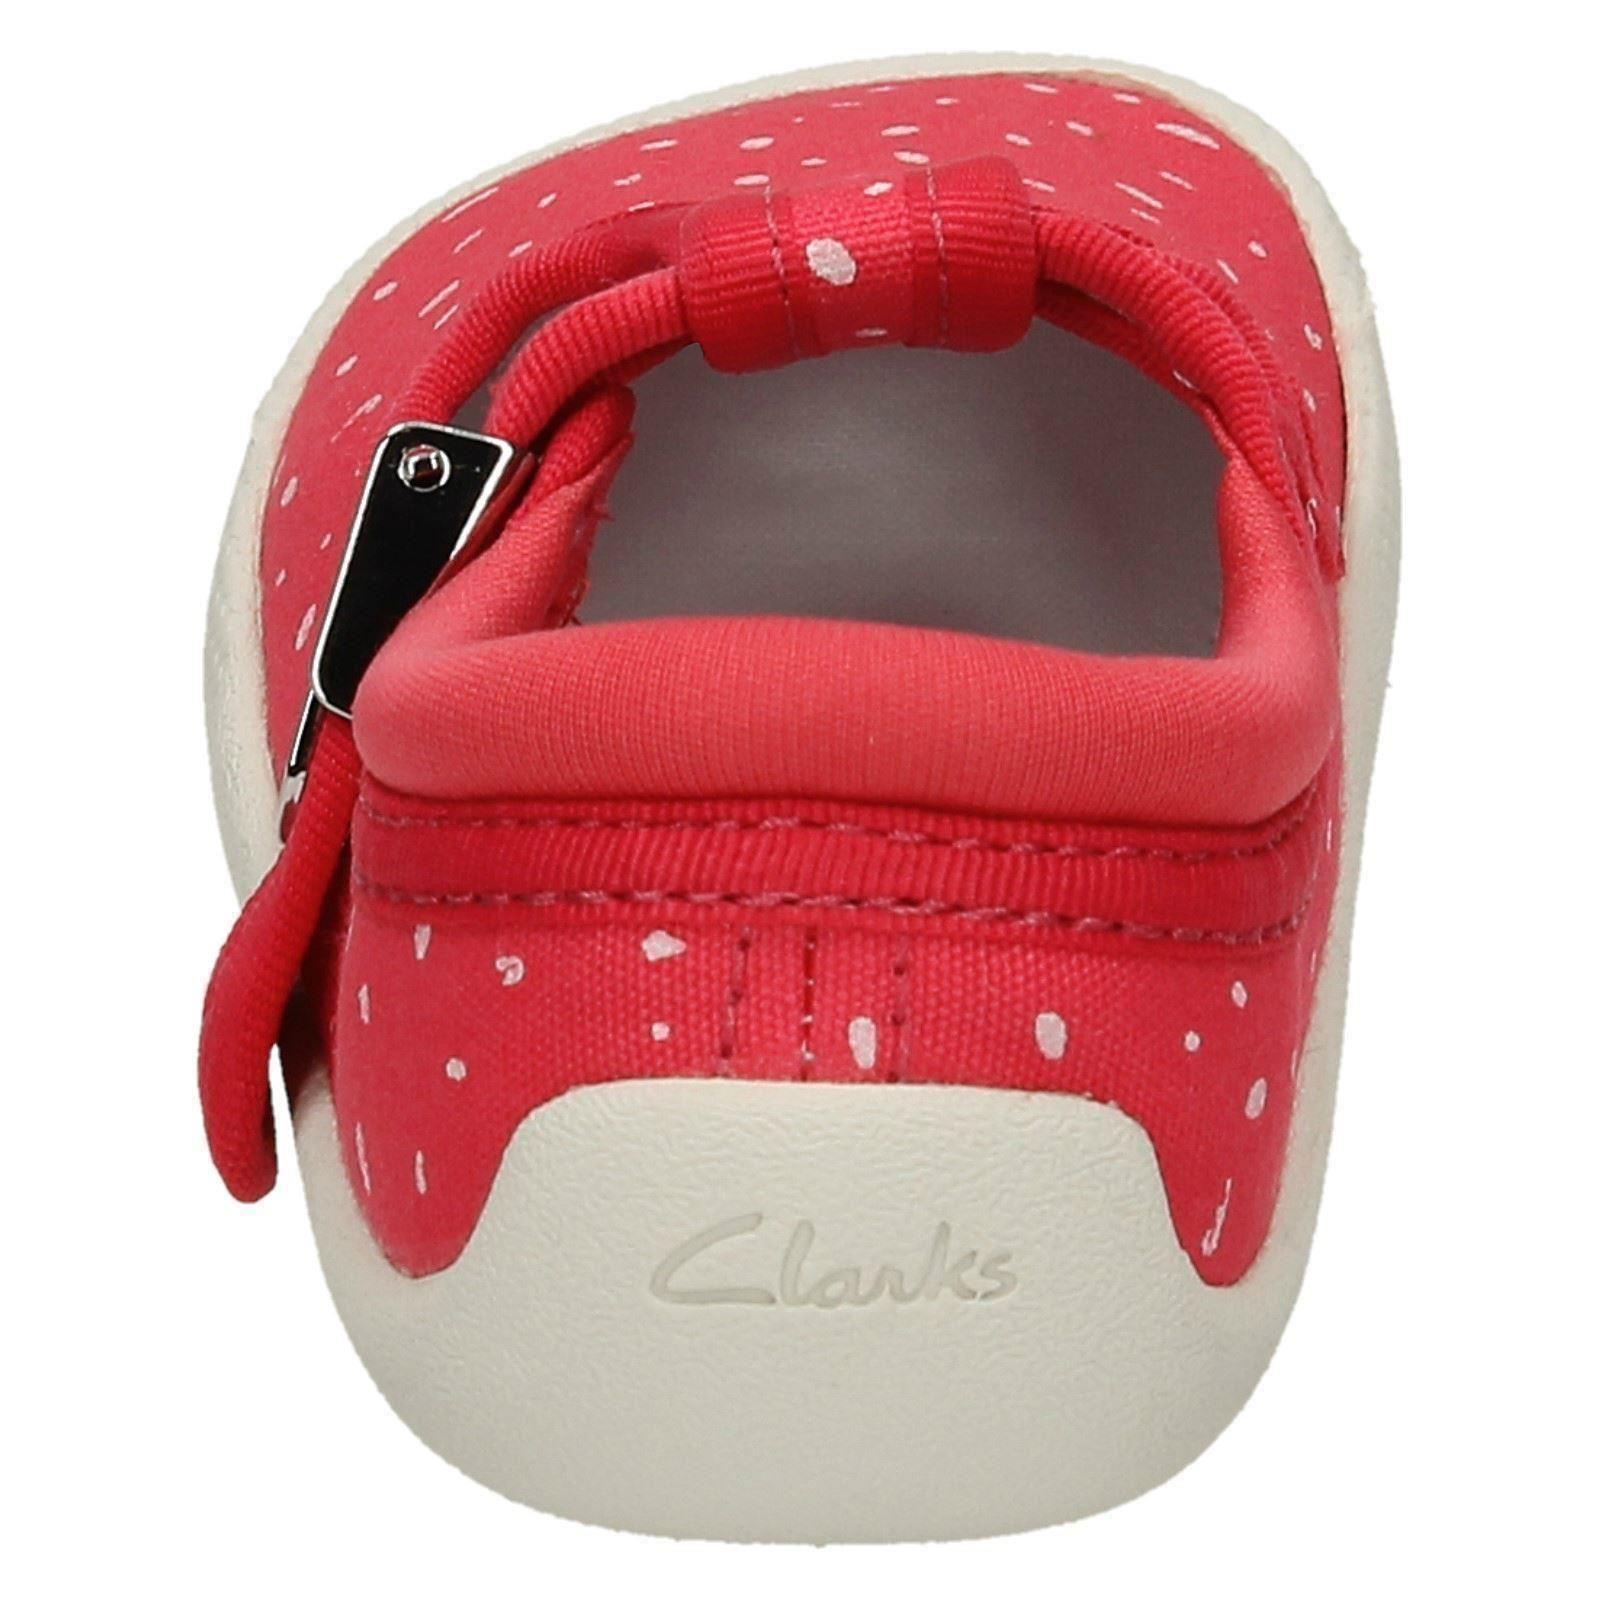 'Infant Girls Clarks' Rounded Toe T-Bar Doodles - Choc Cake